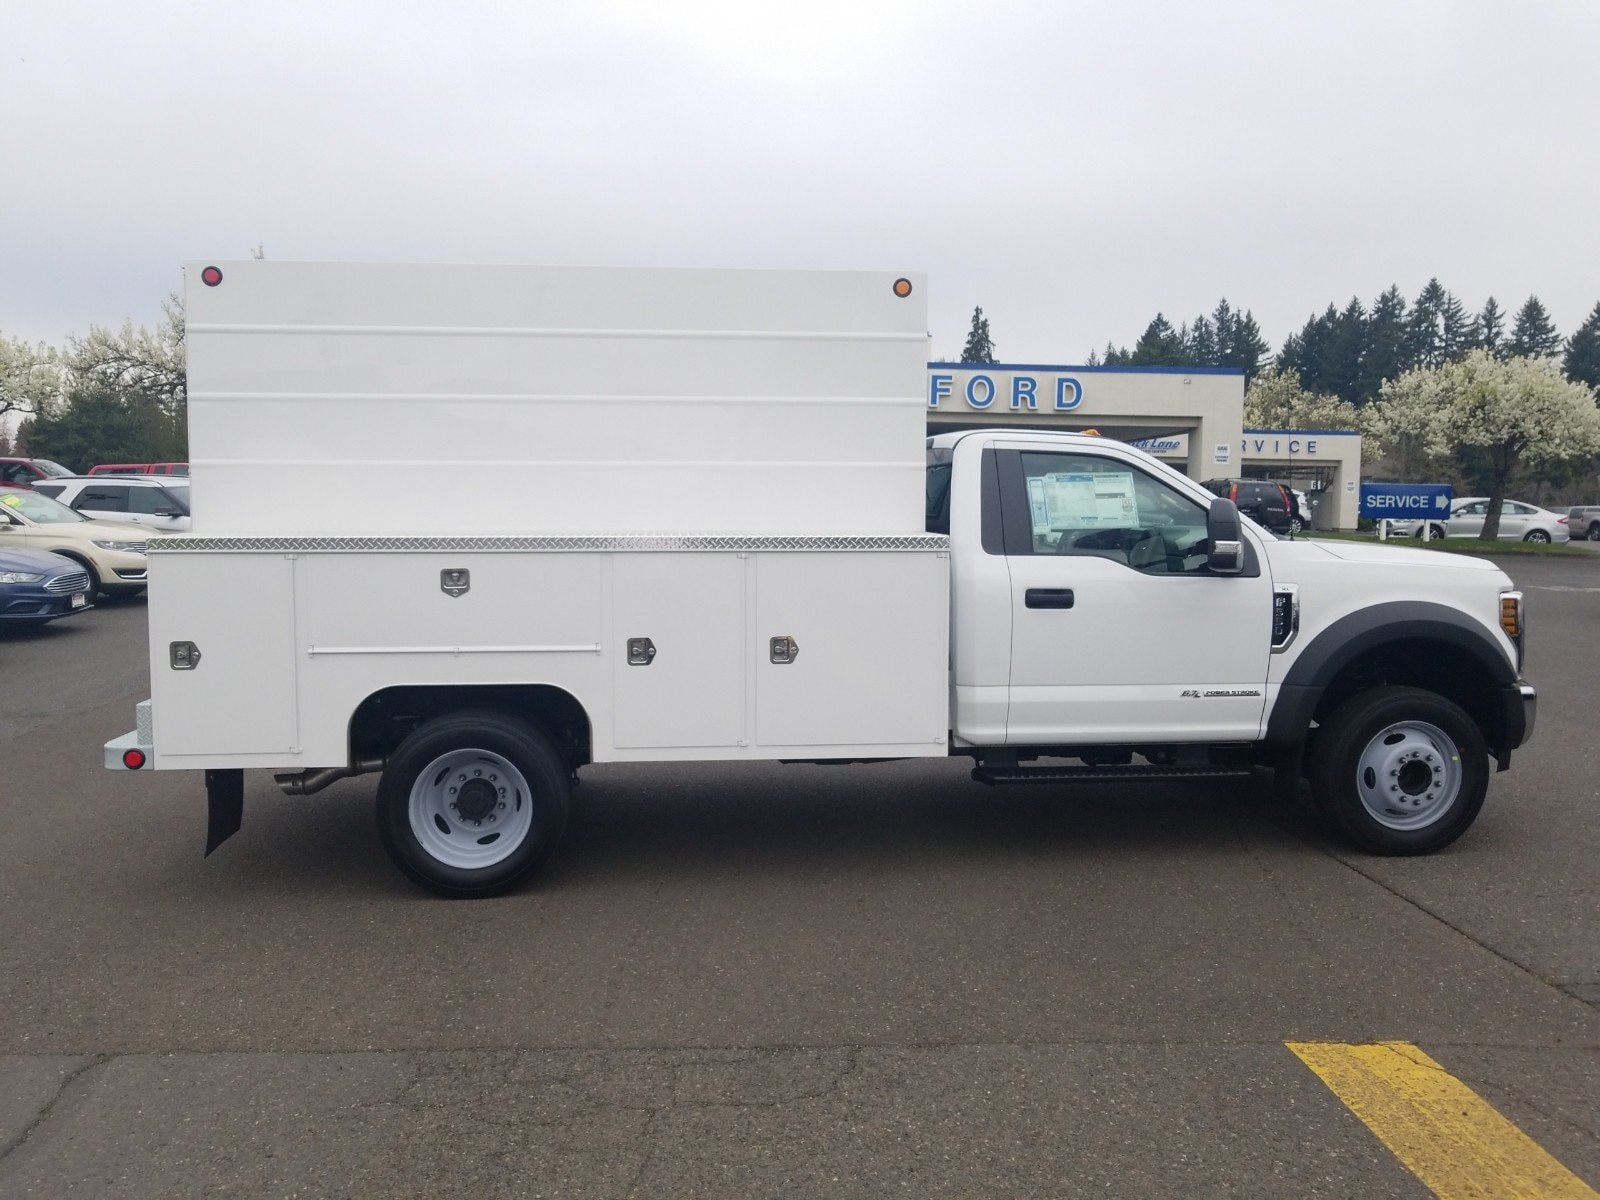 2019 F-550 Regular Cab DRW 4x2, Scelzi Service Body #299674 - photo 1